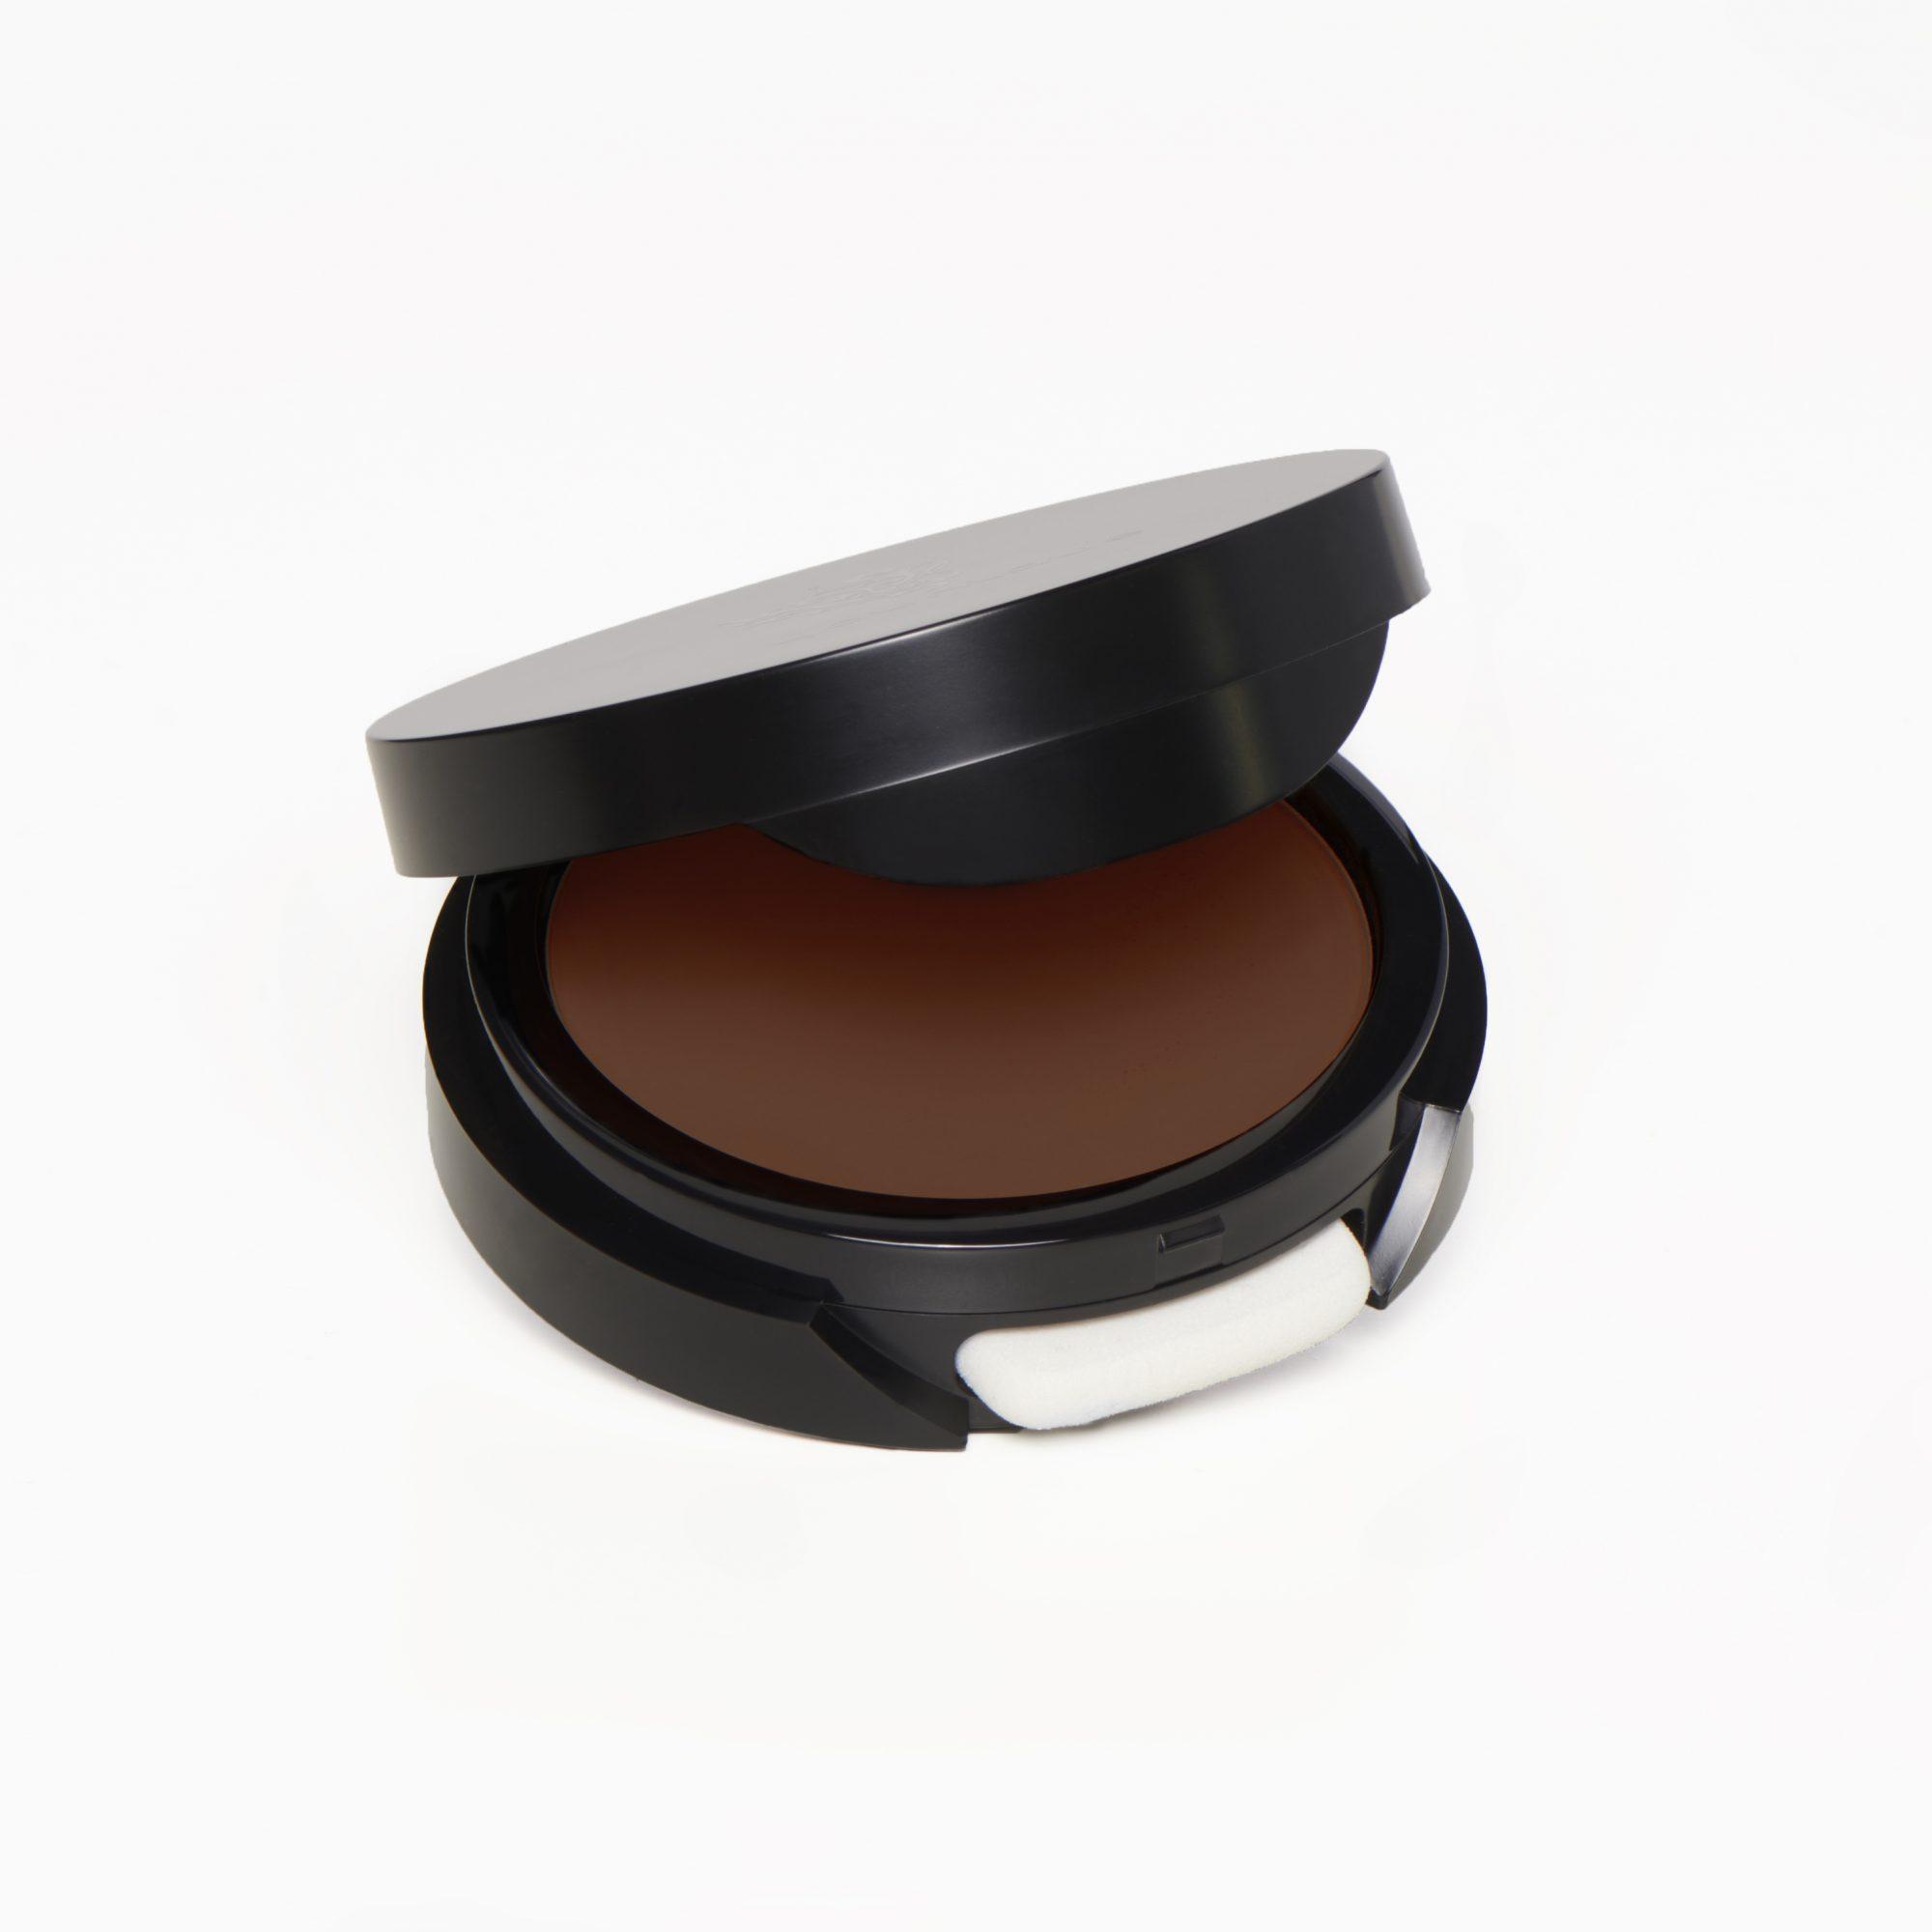 Ser única bases maquillaje pieles oscuras